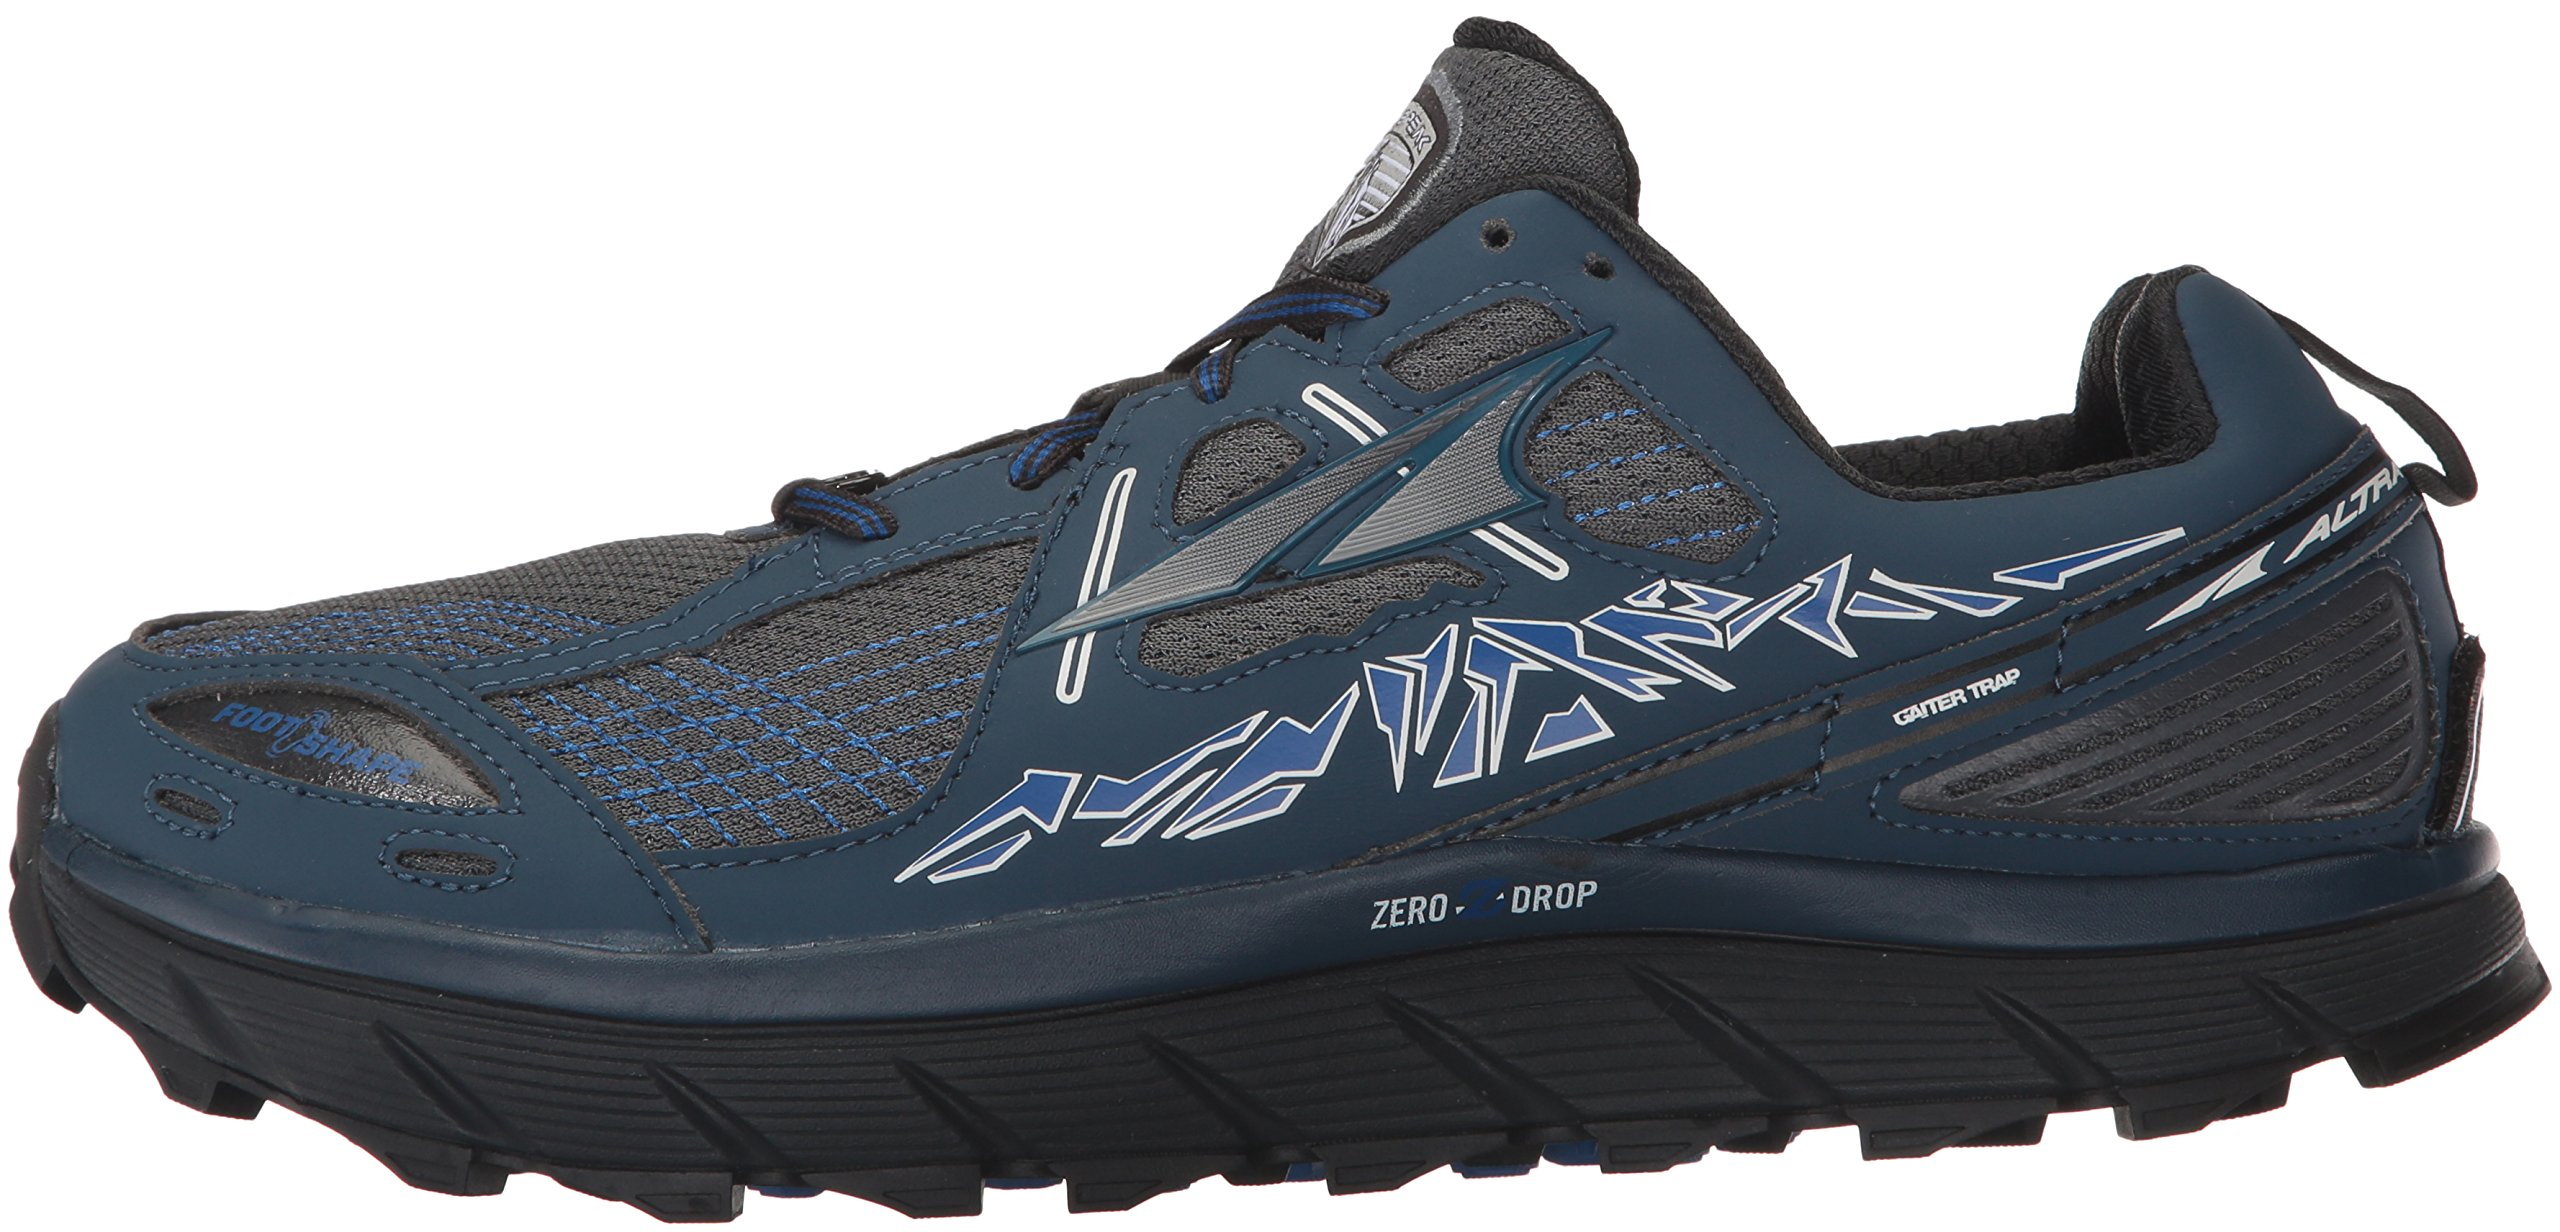 Altra Men's Lone Peak 3.5 Trail Running Shoe, Blue, 12 D US by Altra (Image #5)